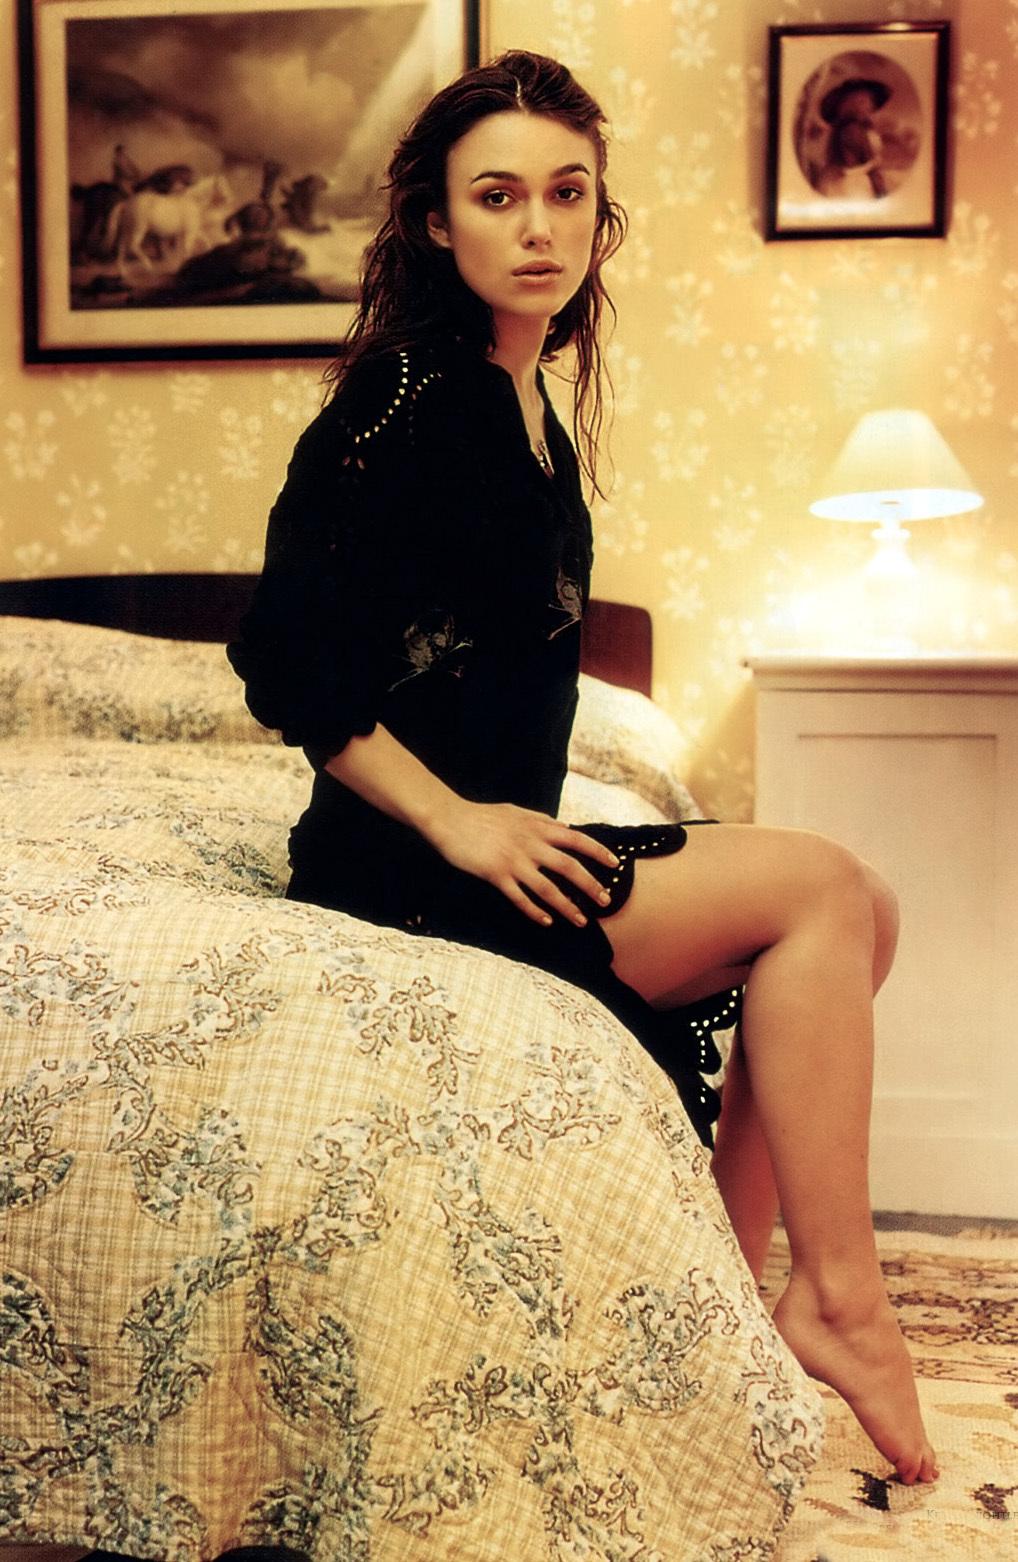 Keira Knightley's Feet